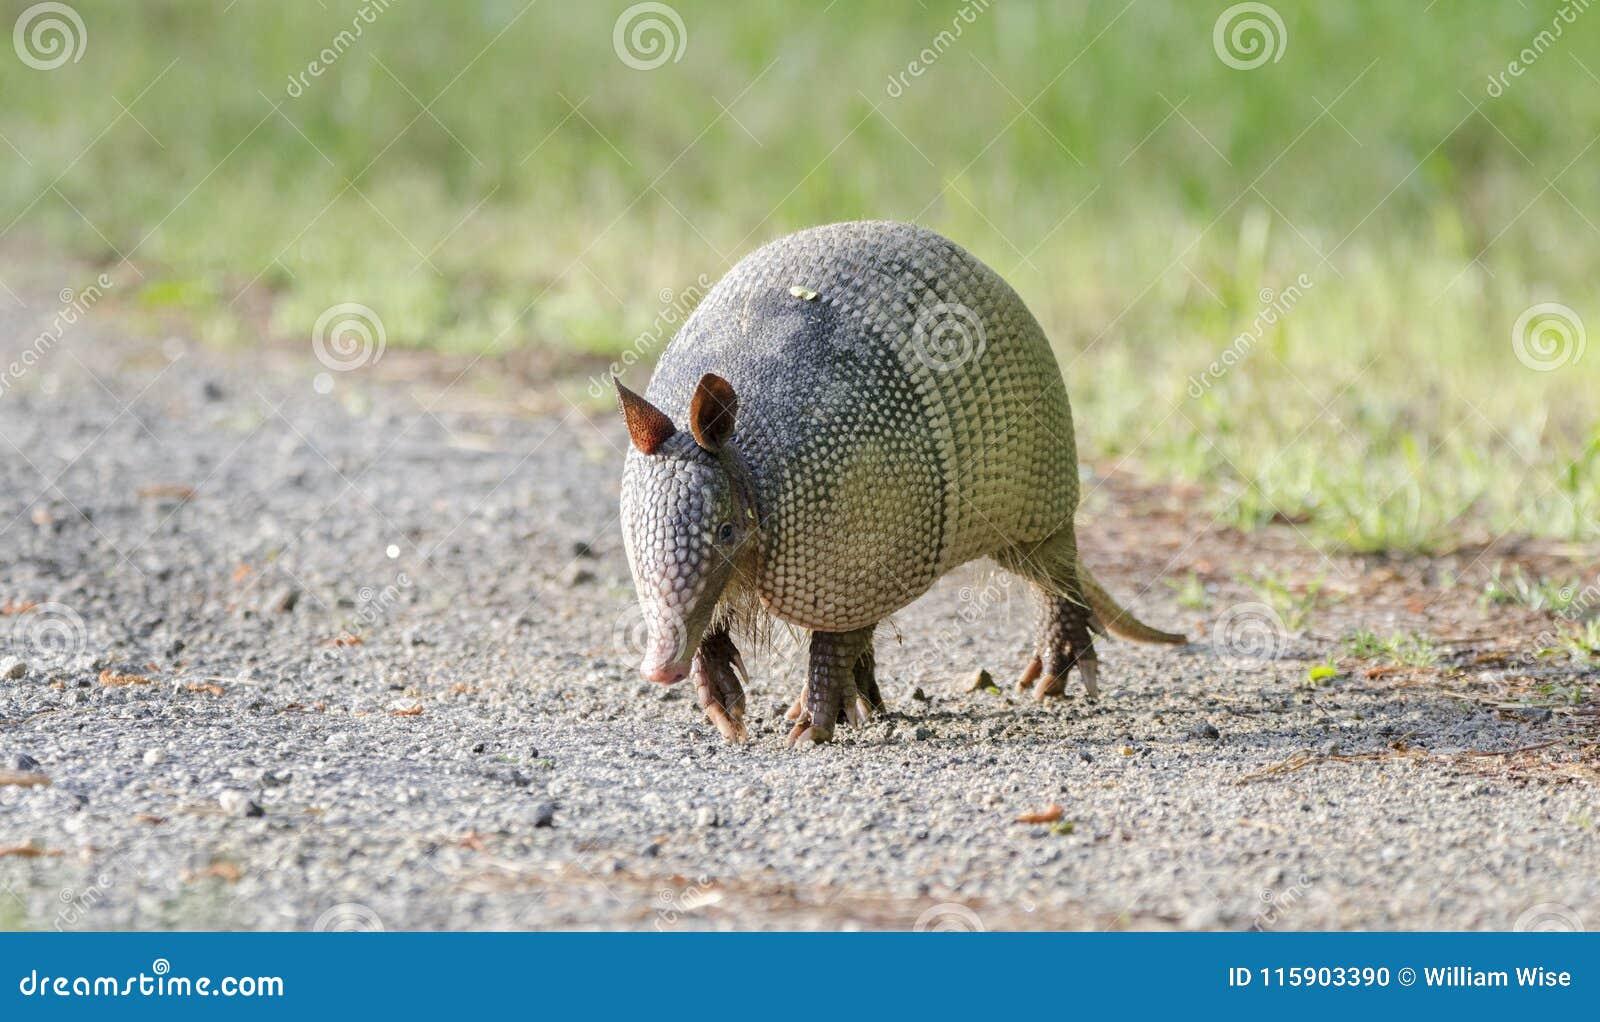 Nine banded armadillo on gravel road, Dasypus novemcinctus, Monroe GA USA